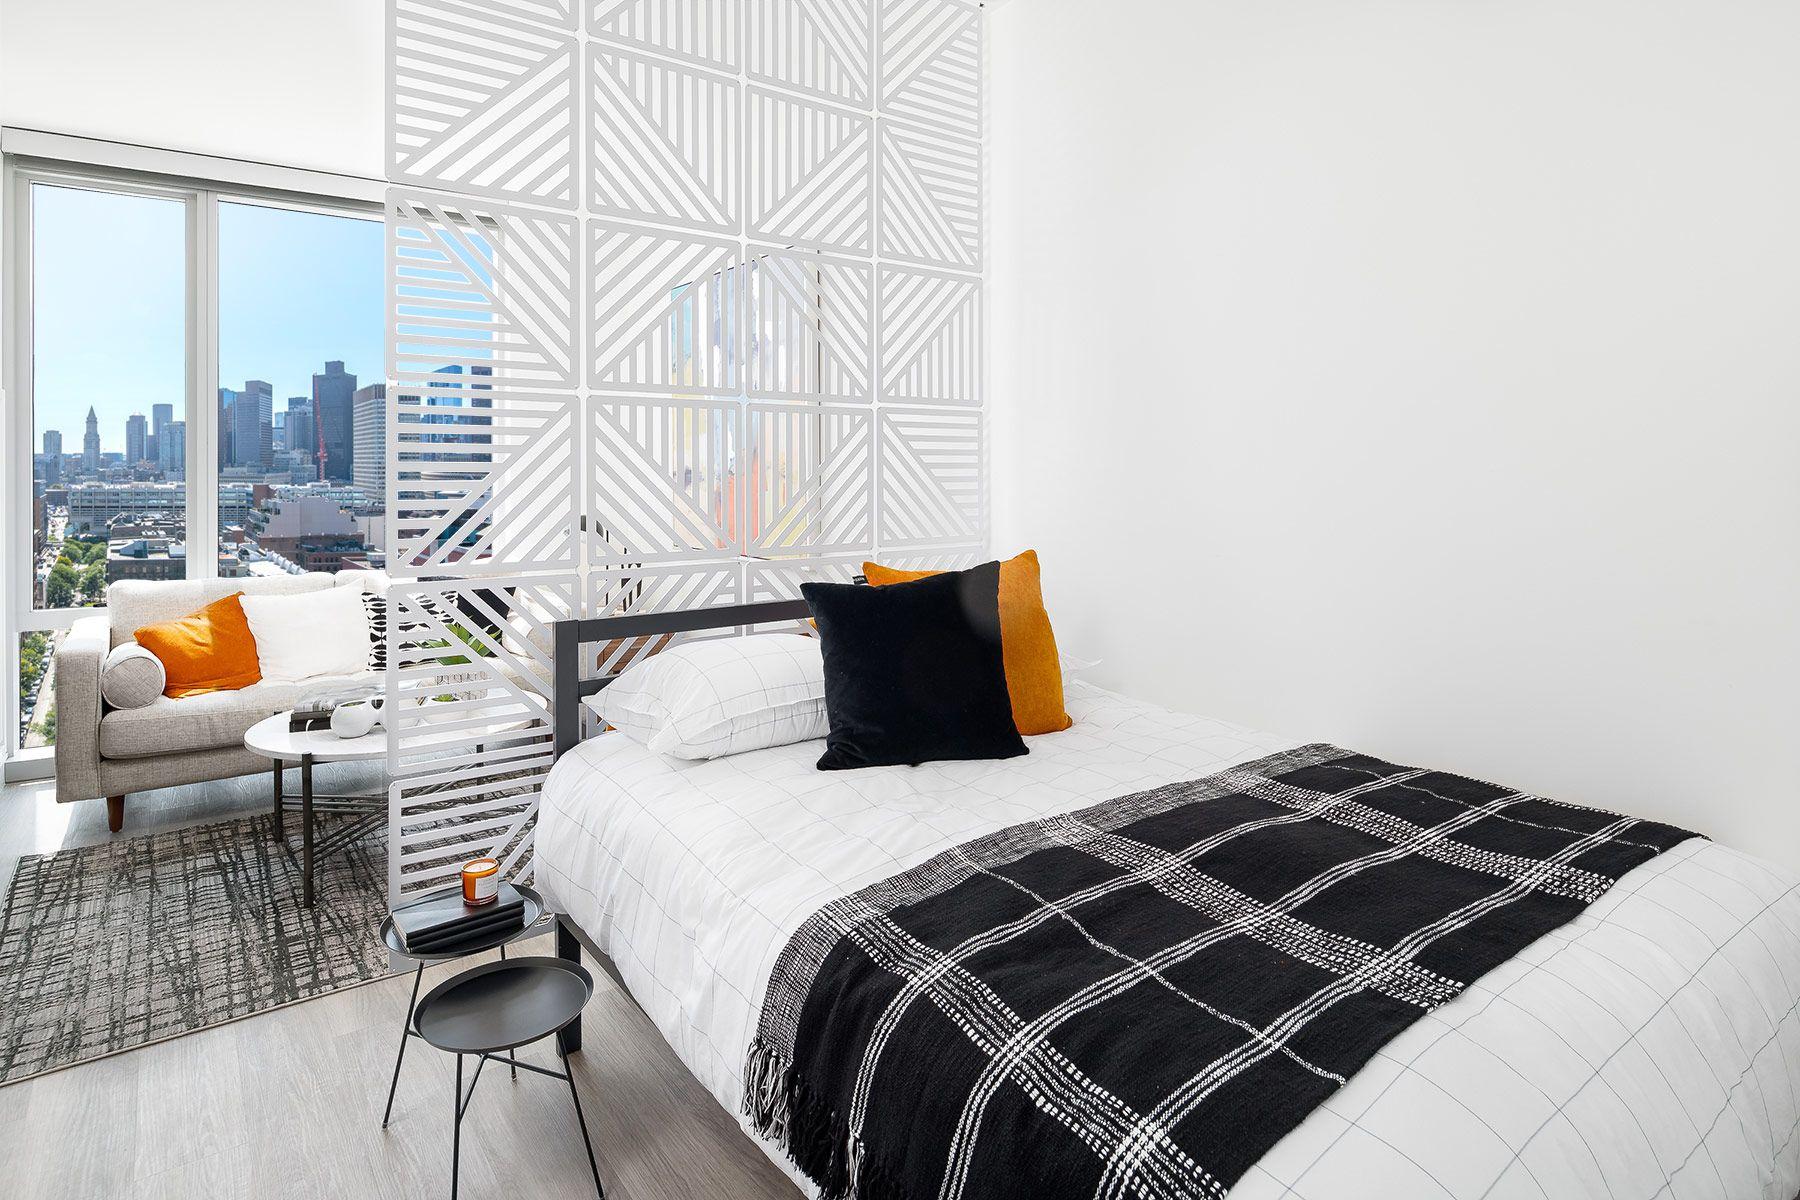 Studio Apartment Inspiration Decor Tips Furnished Apartment Apartment Inspiration Studio Apartment Inspiration Get bedroom apartments boston